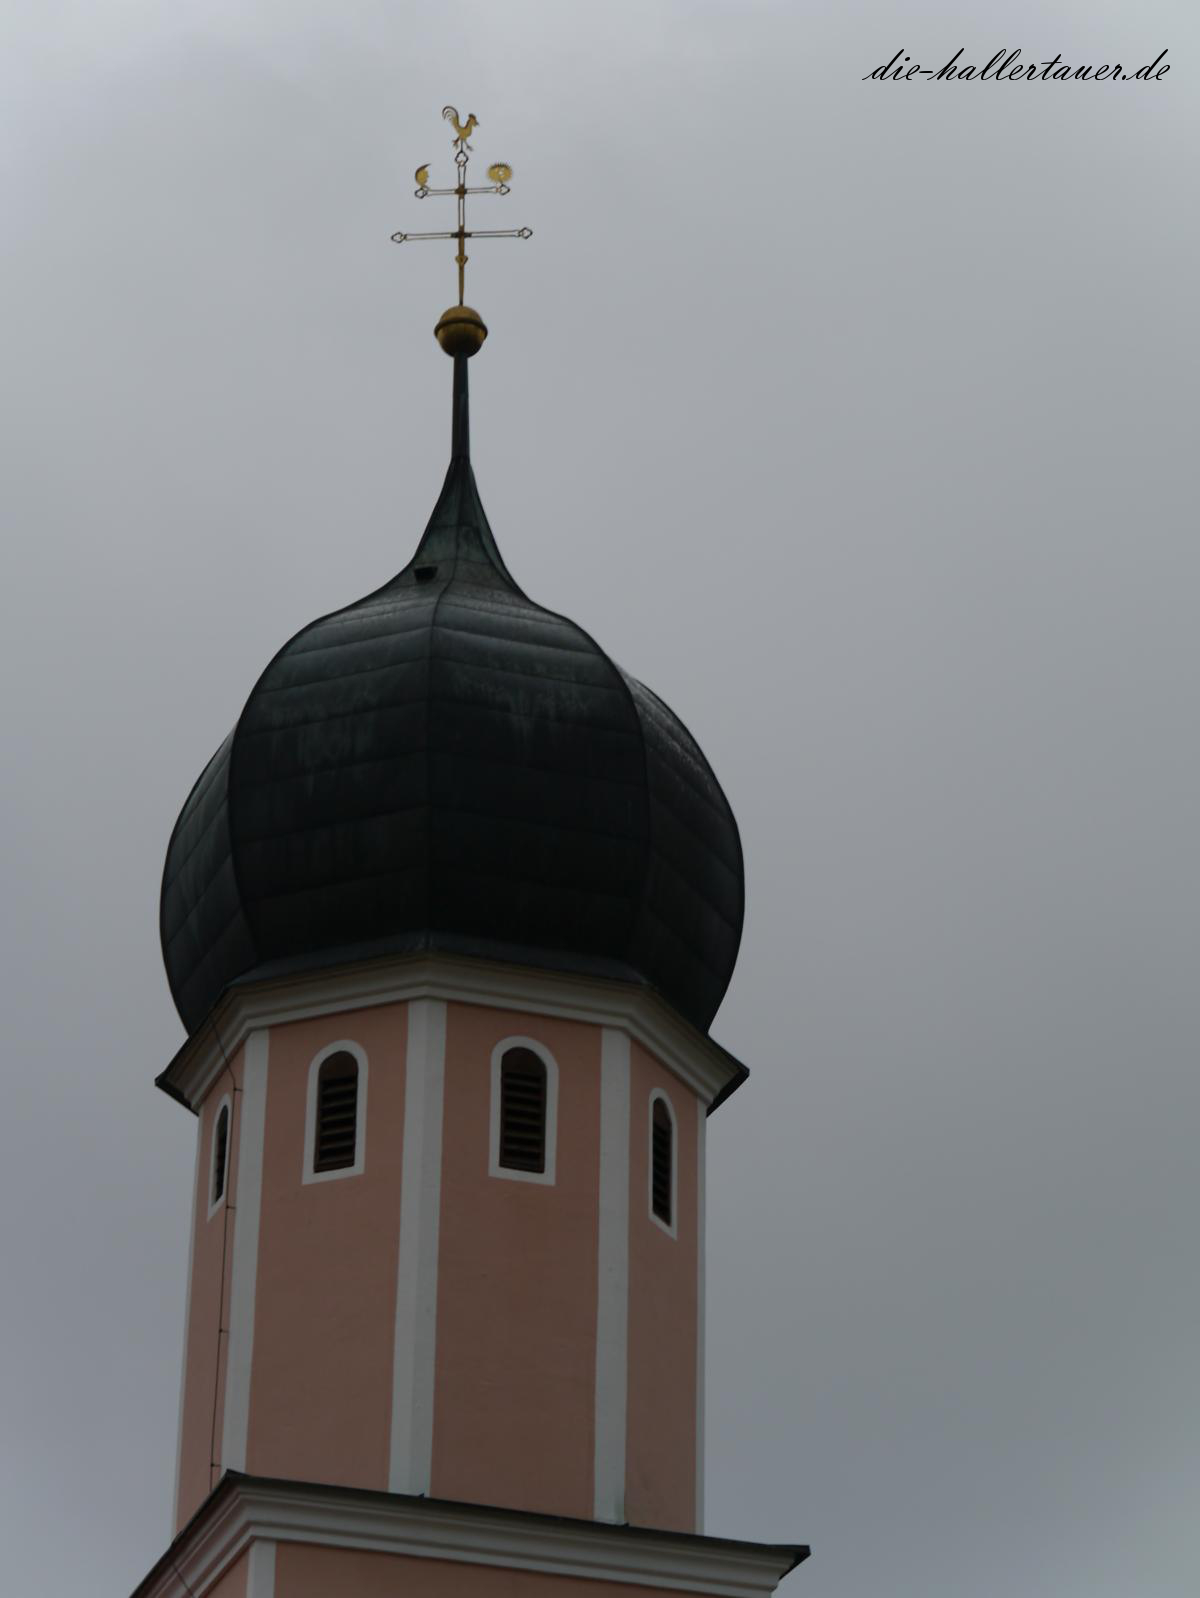 Kirchturmrätsel der Hallertau